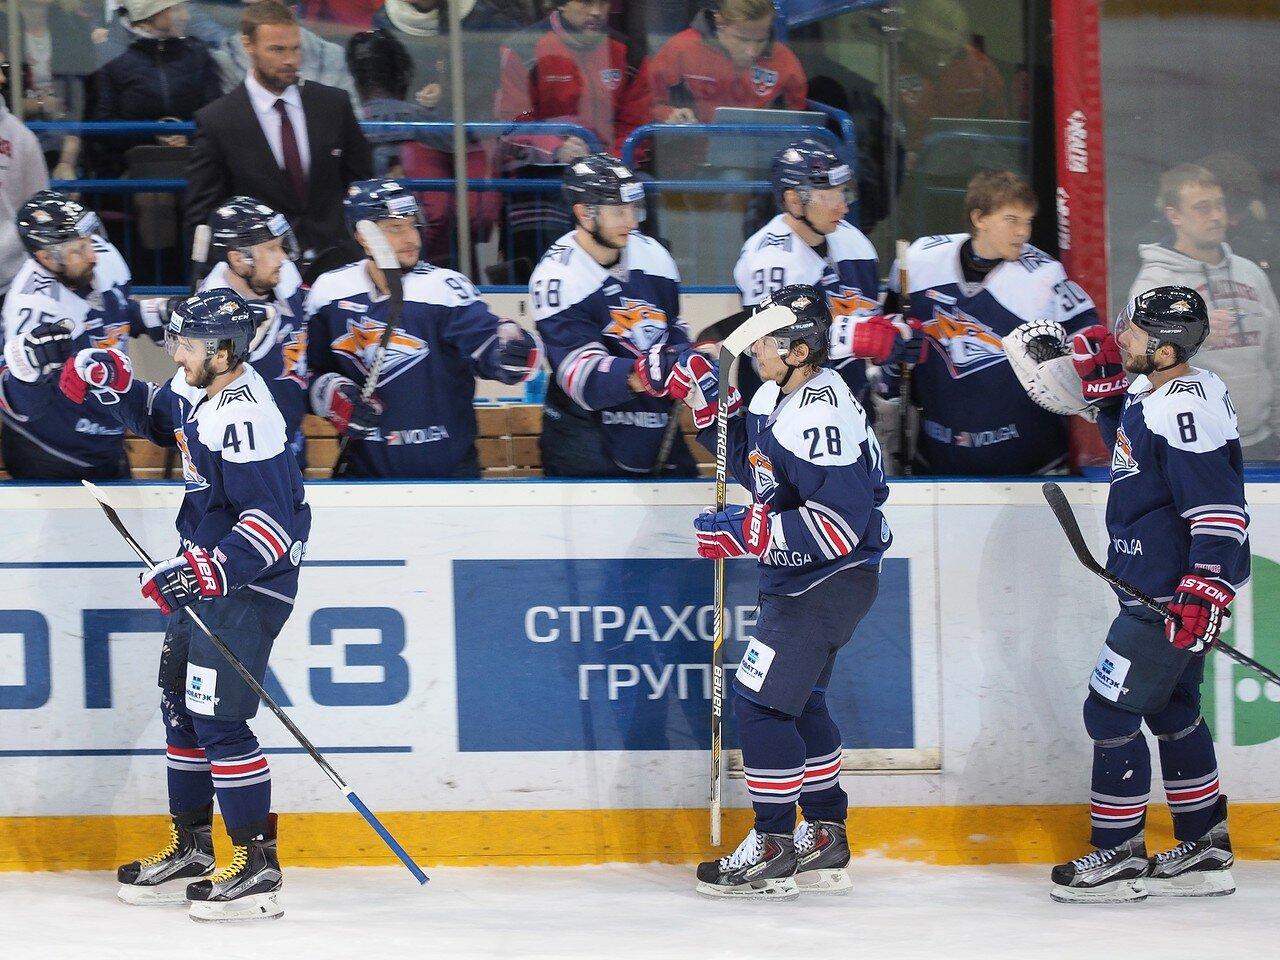 28Плей-офф 2016 Восток Финал Металлург - Салават Юлаев 25.03.2016